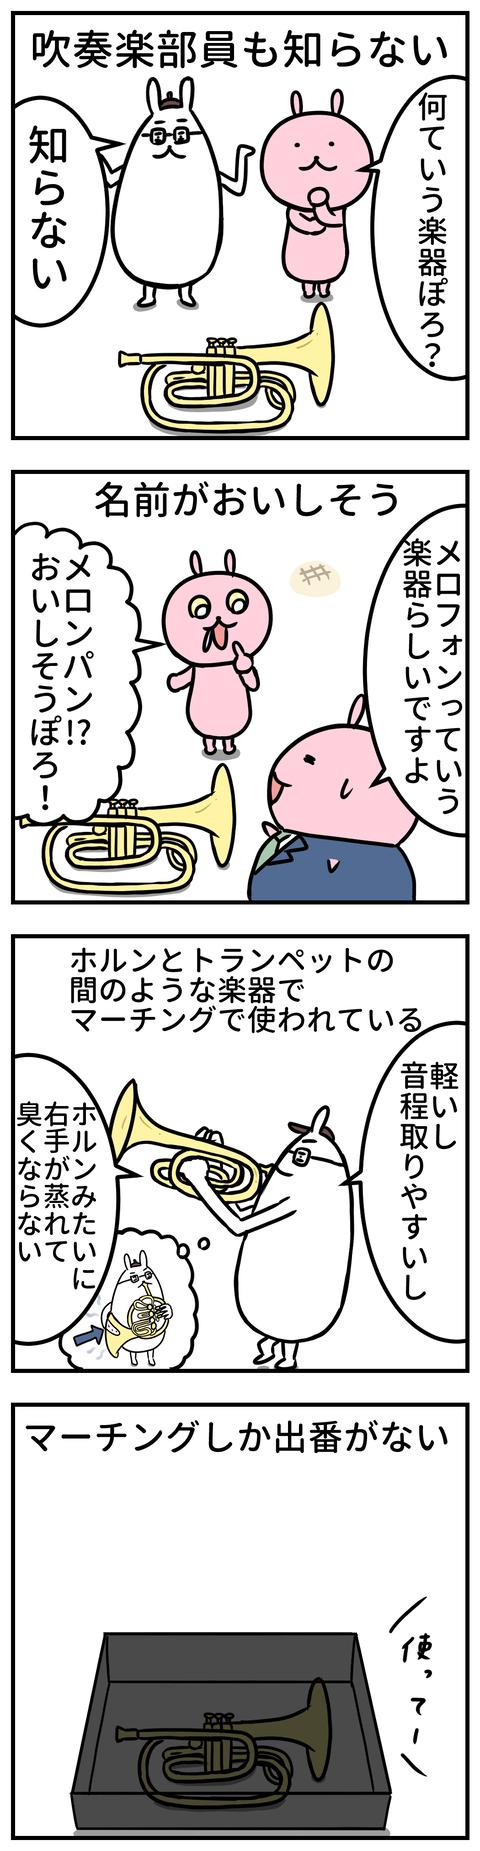 manga-yuzuporo107-1